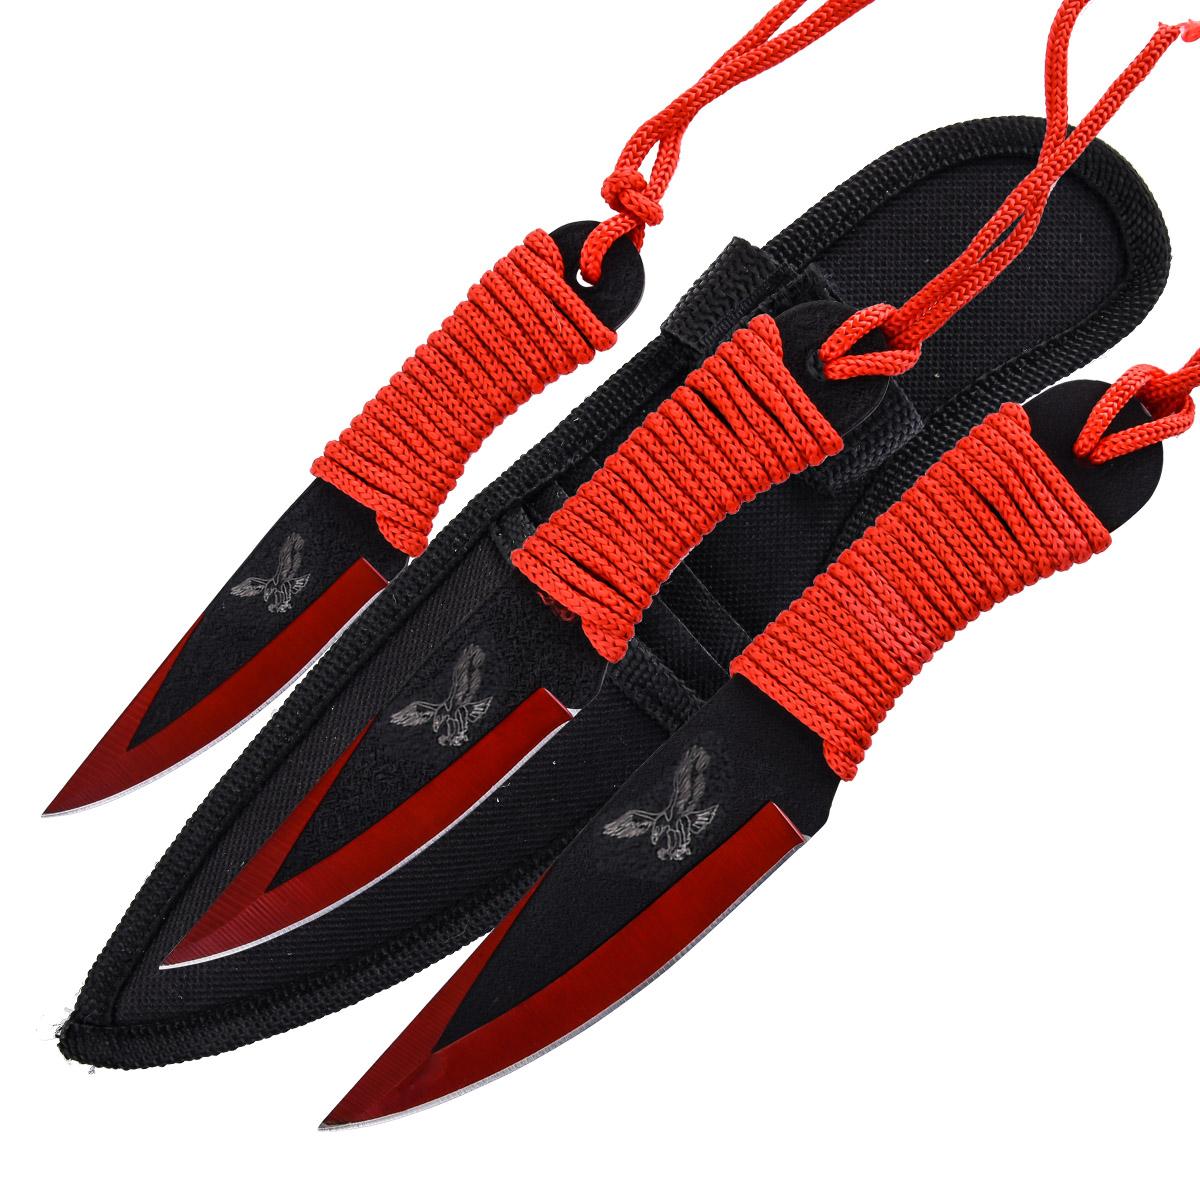 Ножи для спортивного метания